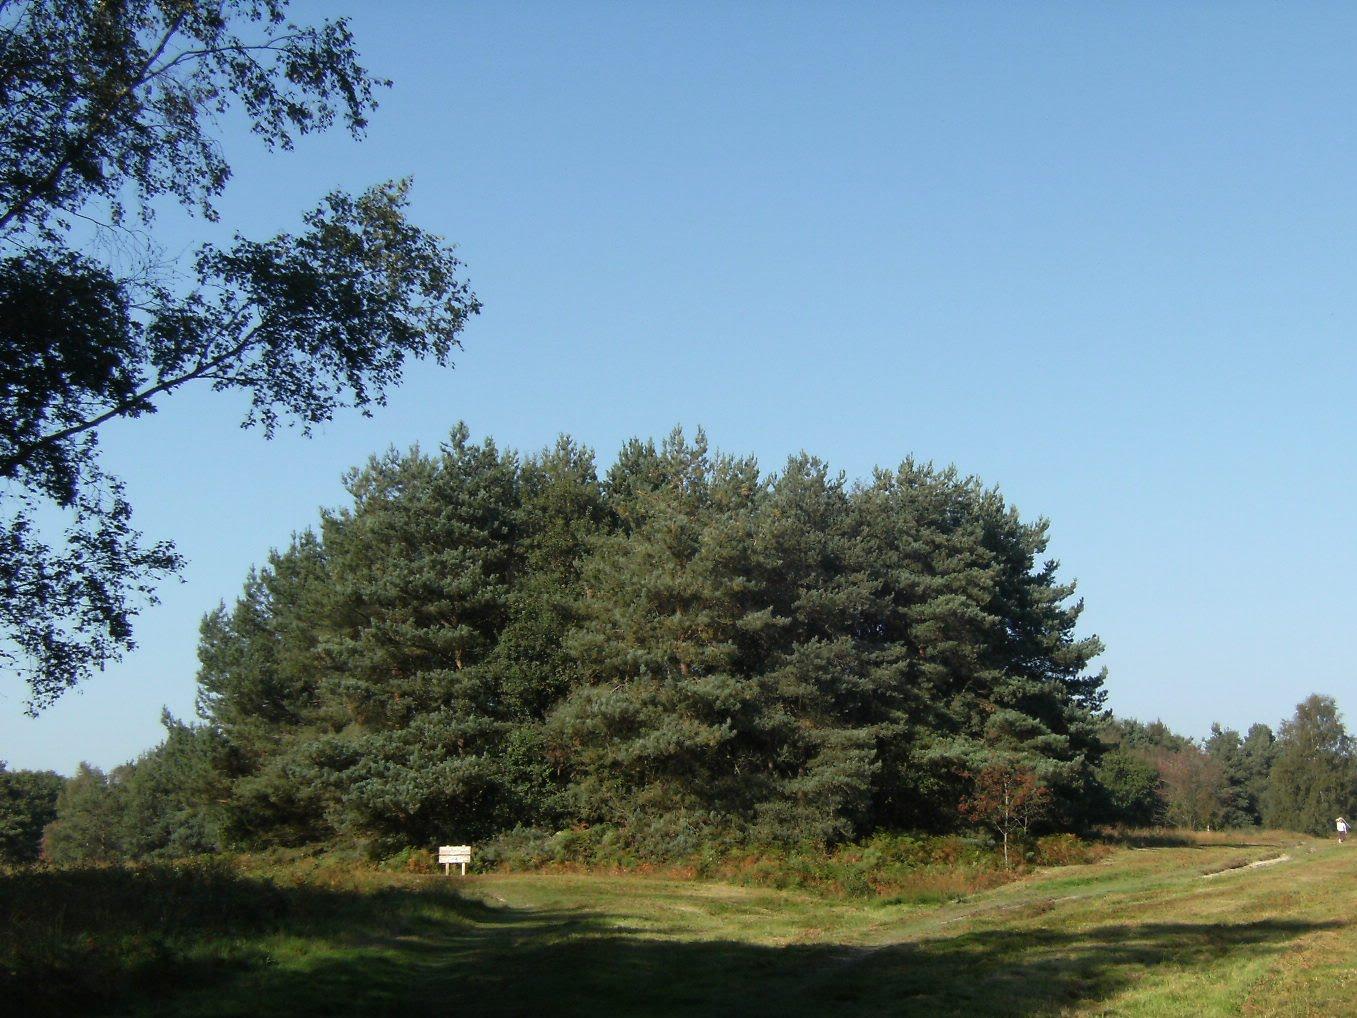 DSCF9808 MacMillan Clump, Ashdown Forest